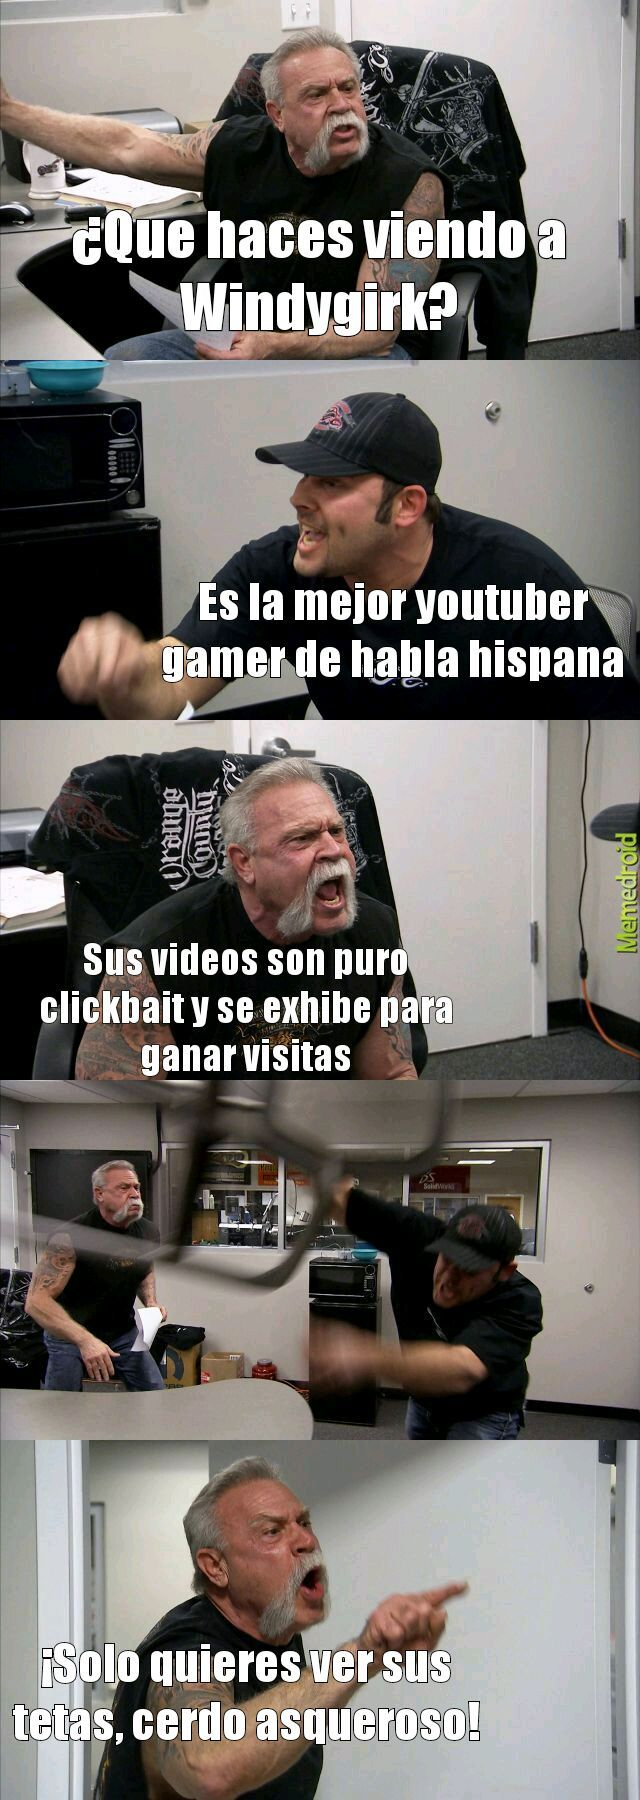 Chile no fue al mundial - meme